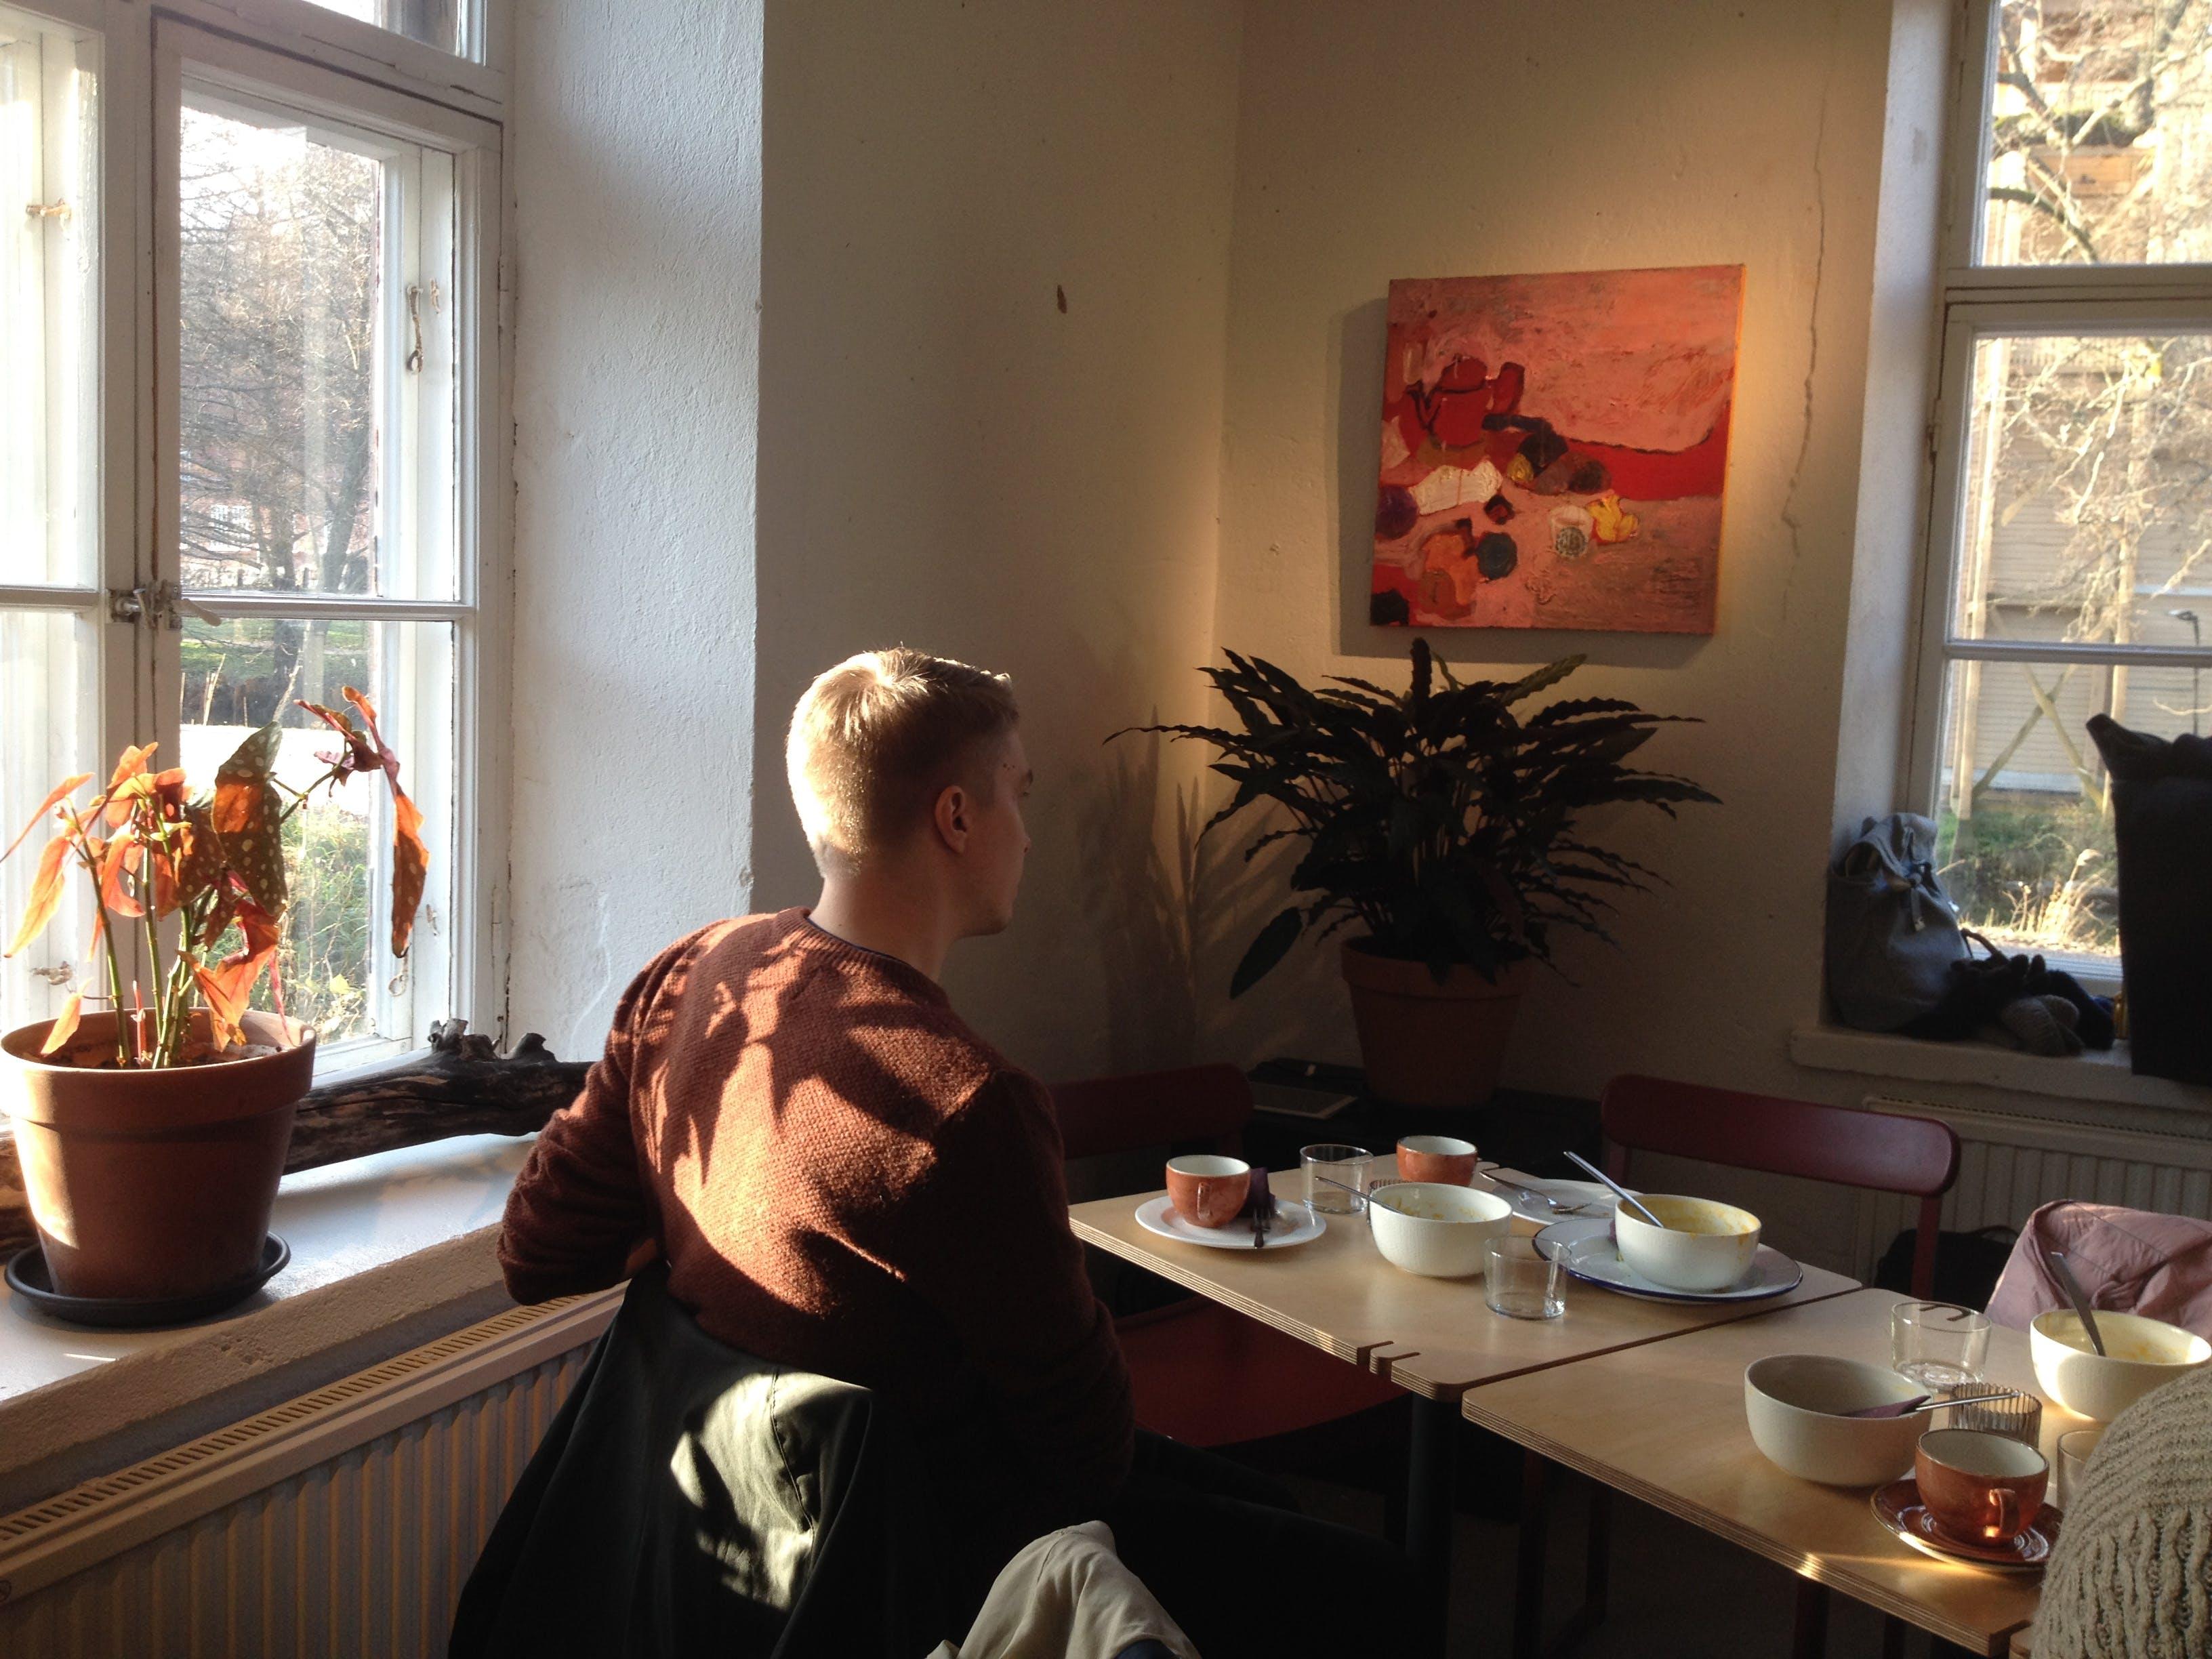 Punainen asetelma, 60cm x 60cm, öljy/tempera kankaalle, 2019, Cafe Pesula Fiskars